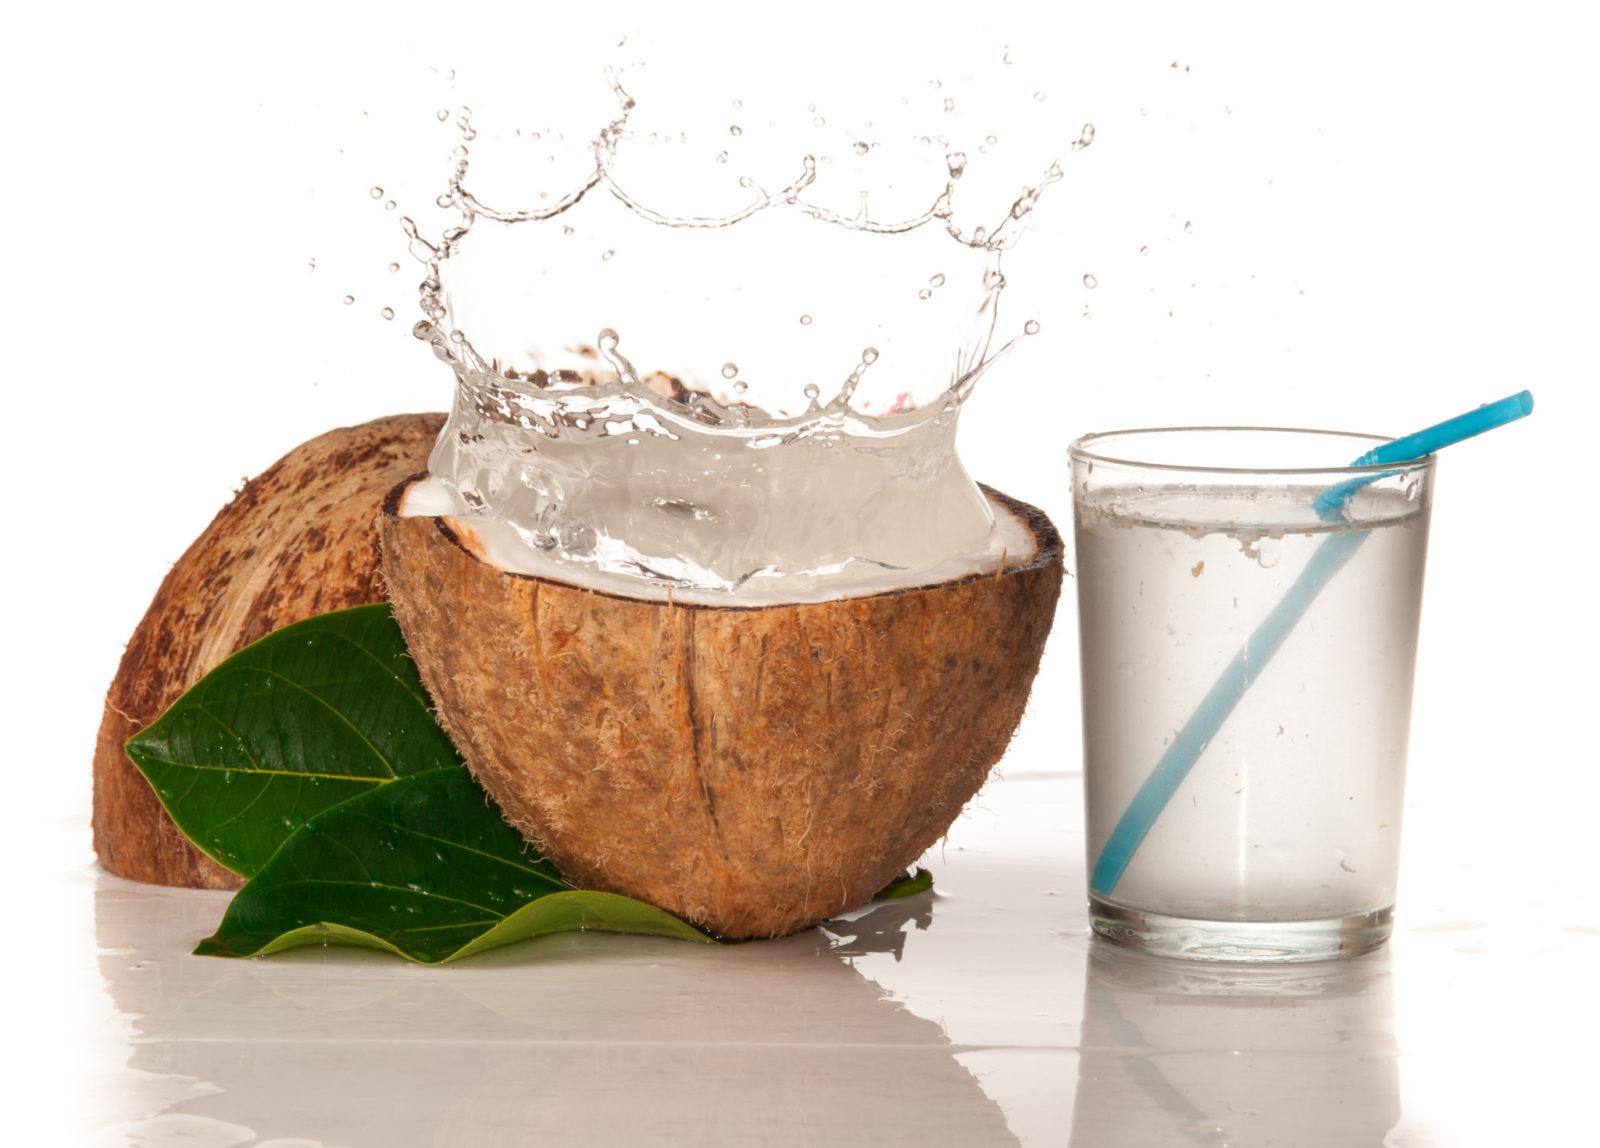 INBV-Coconut-Water-shutterstock